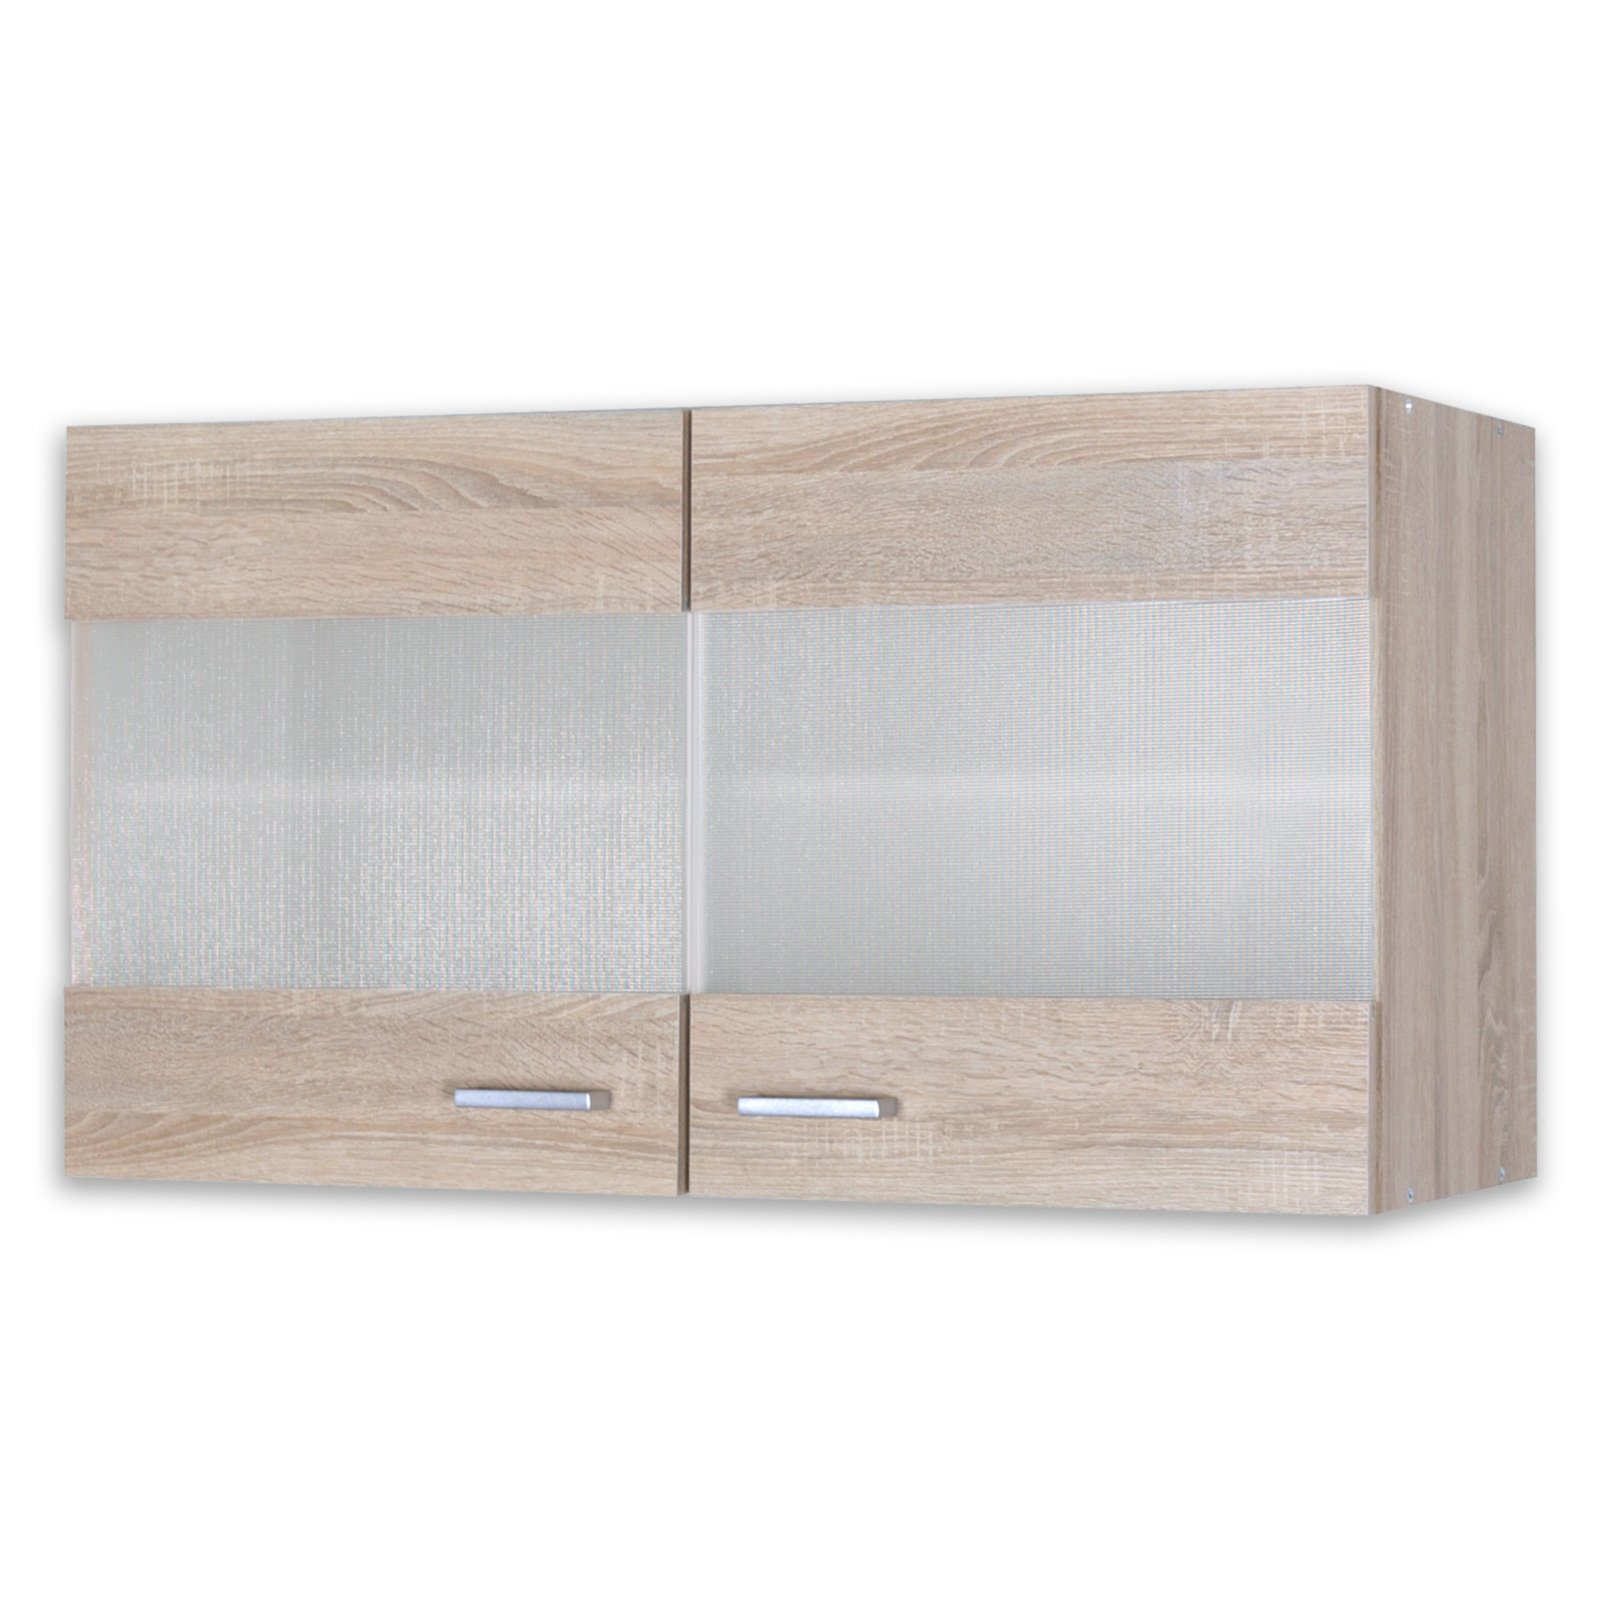 glas h ngeschrank sinja sonoma eiche 100x35 cm h ngeschr nke einzelschr nke. Black Bedroom Furniture Sets. Home Design Ideas